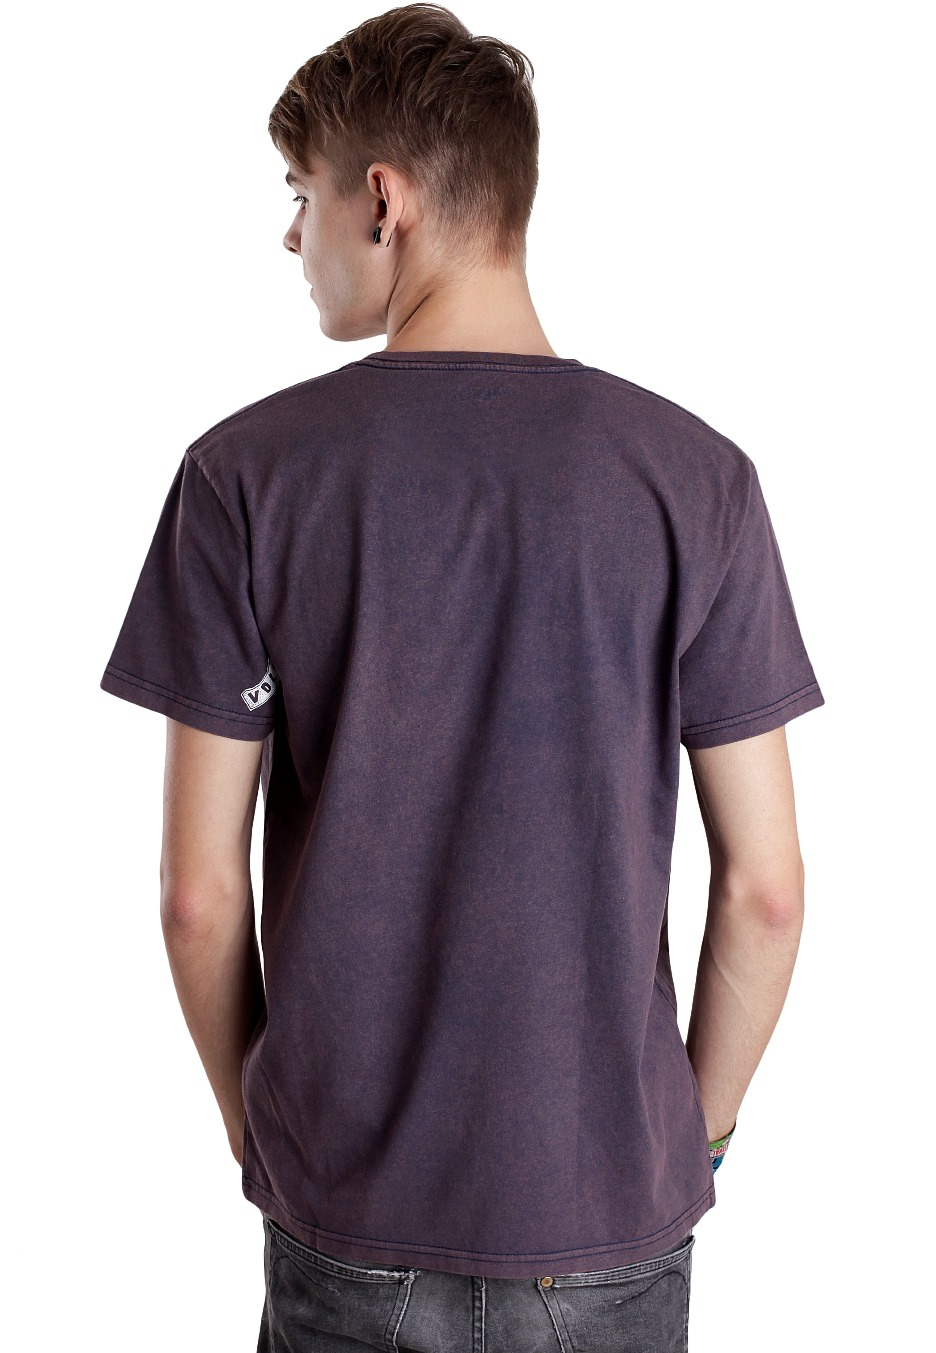 e9dfaf4609 Volcom - Club Nowhere Vintage Navy - T-Shirt - Boutique streetwear ...